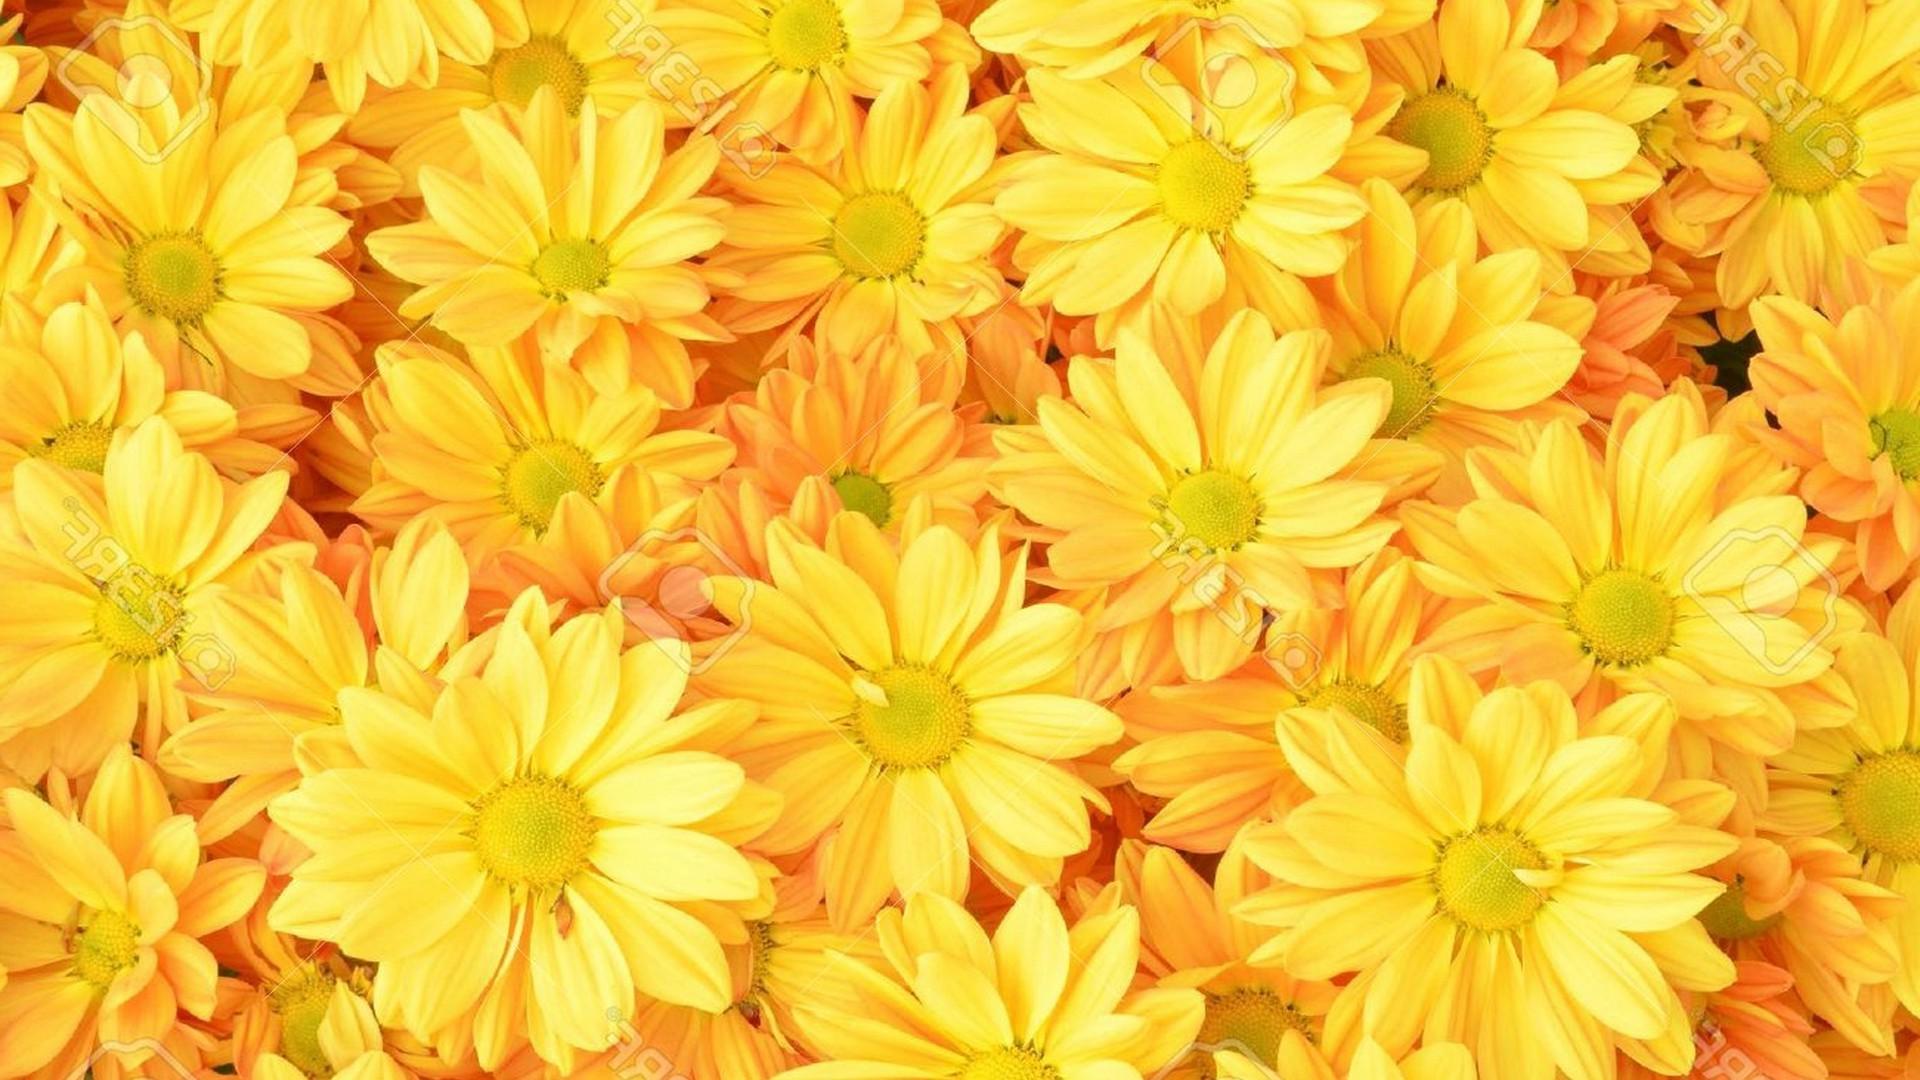 Res: 1920x1080, Yellow Chrysanthemum Flowers Background